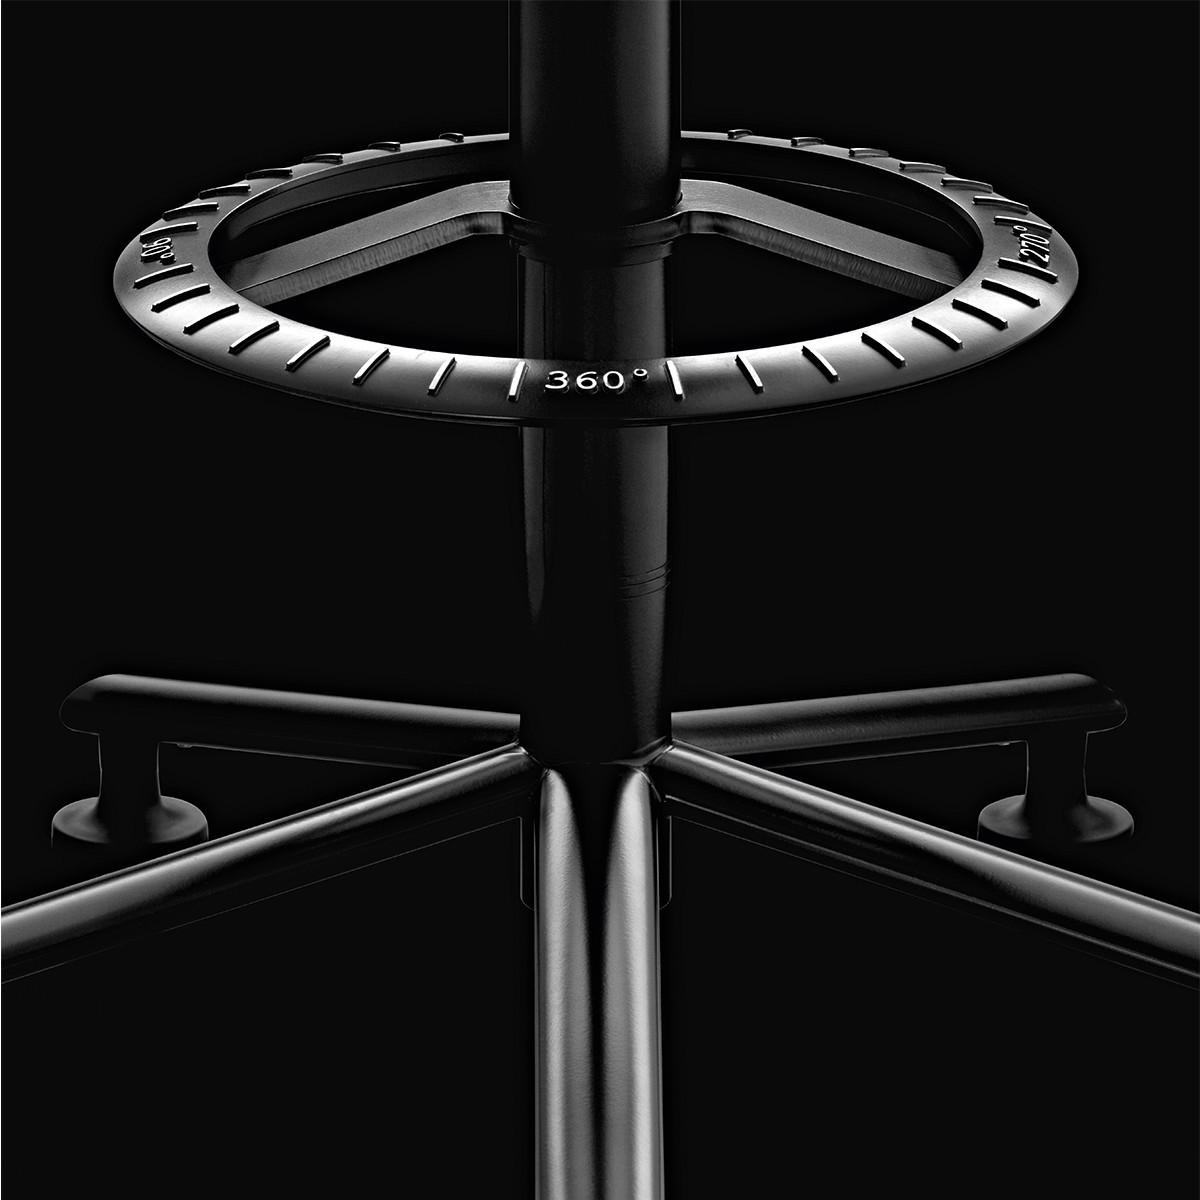 magis 360 hocker auf rollen drehbar casa de. Black Bedroom Furniture Sets. Home Design Ideas